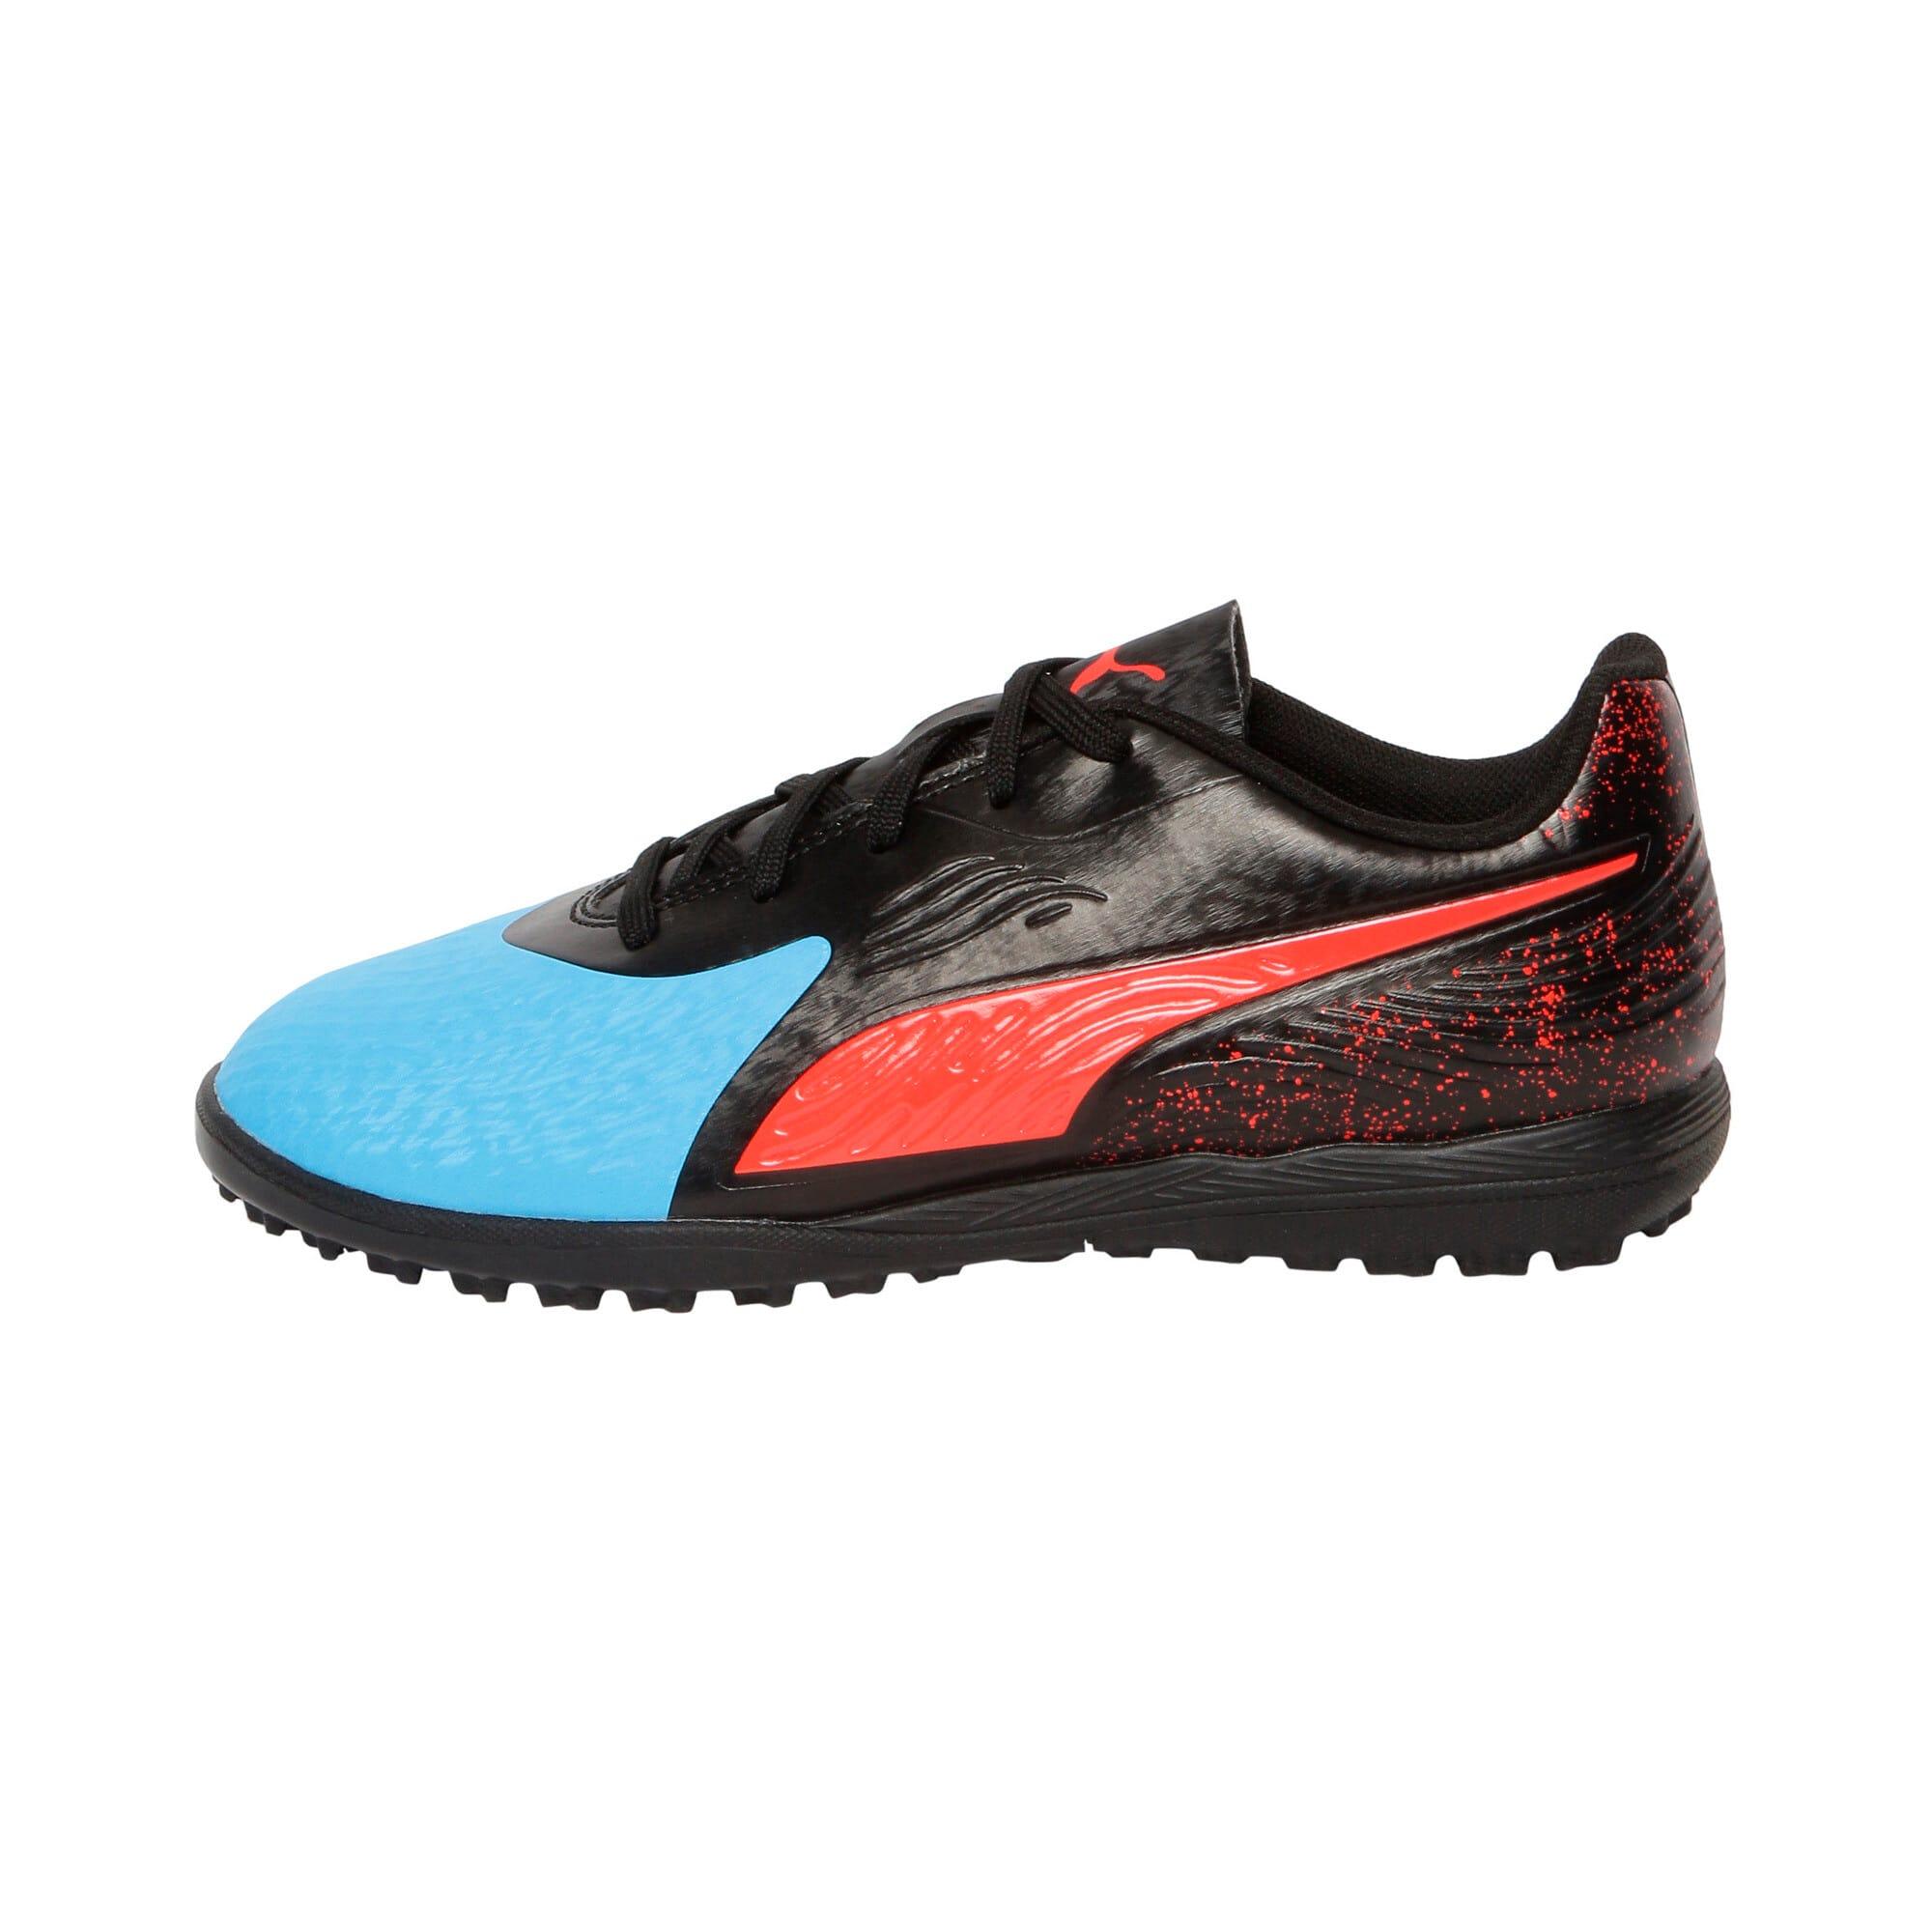 Thumbnail 1 of PUMA ONE 19.4 TT Youth Football Boots, Bleu Azur-Red Blast-Black, medium-IND